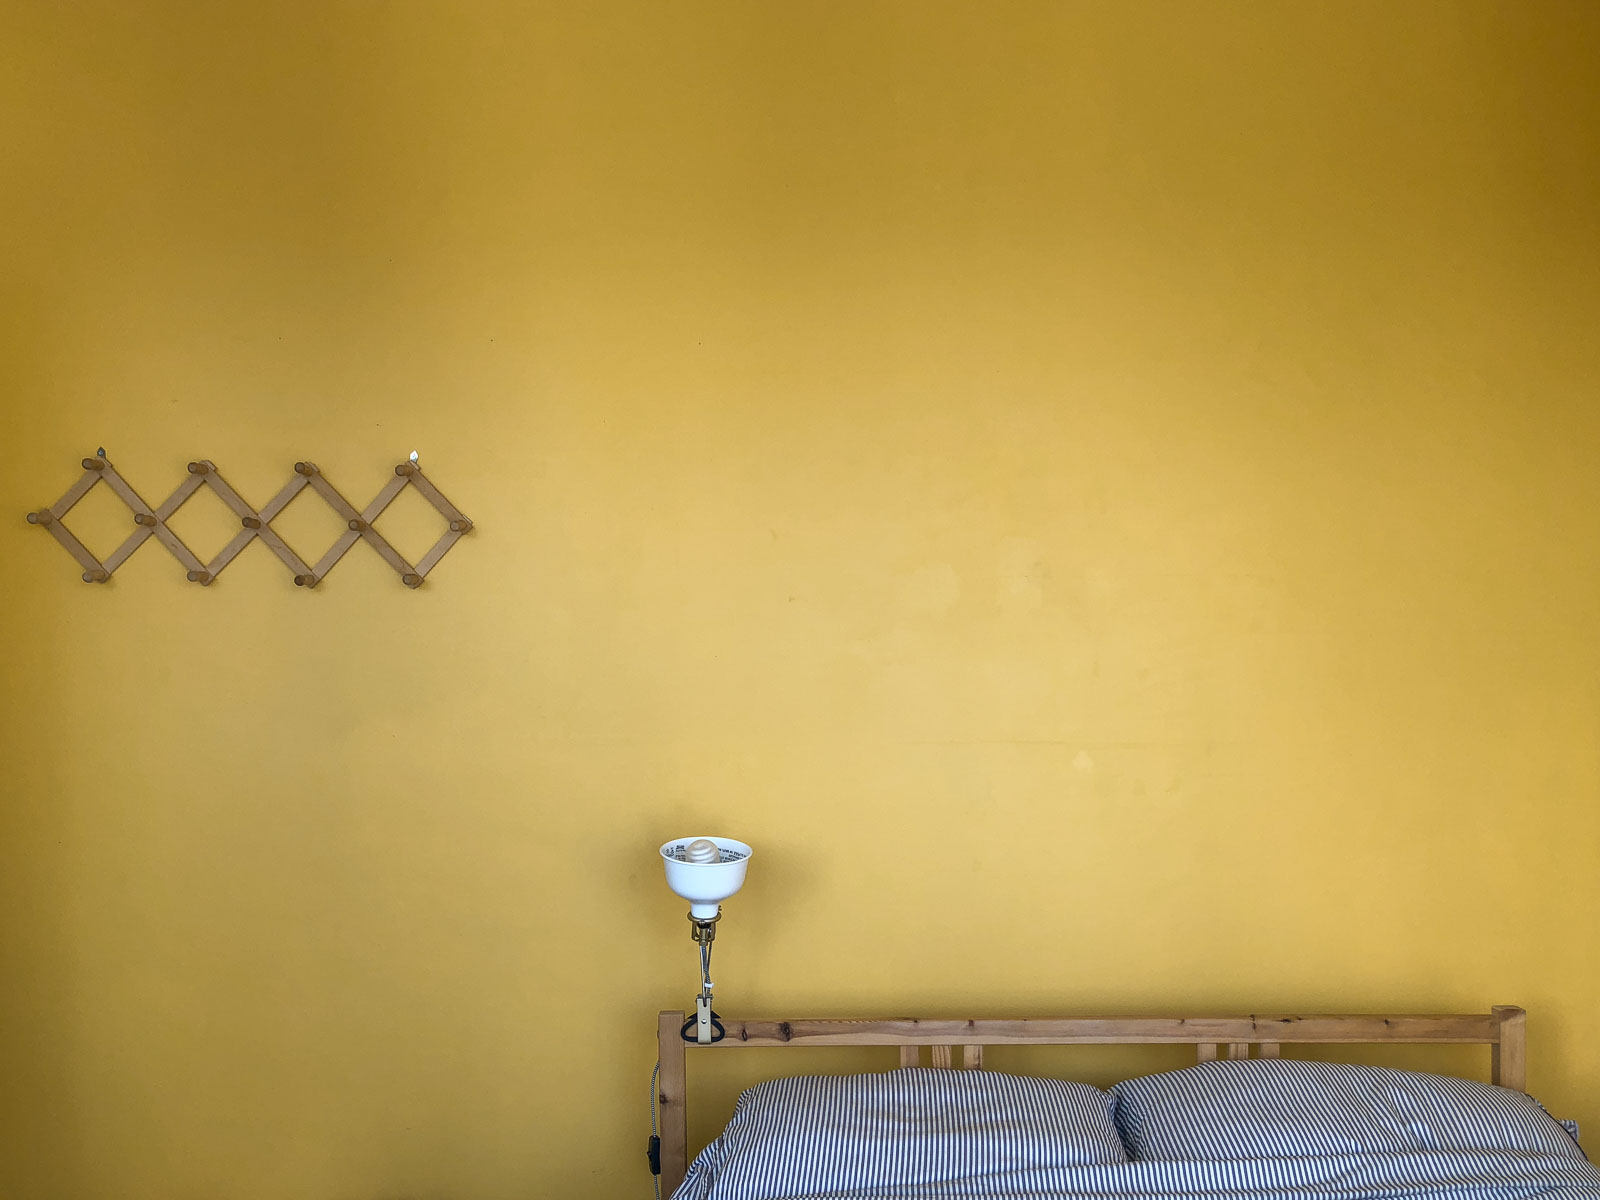 Sunny-Day-homestudiolist-Los-Angeles-LA-photoshoot-location-natural-light-southern-california-4.jpg